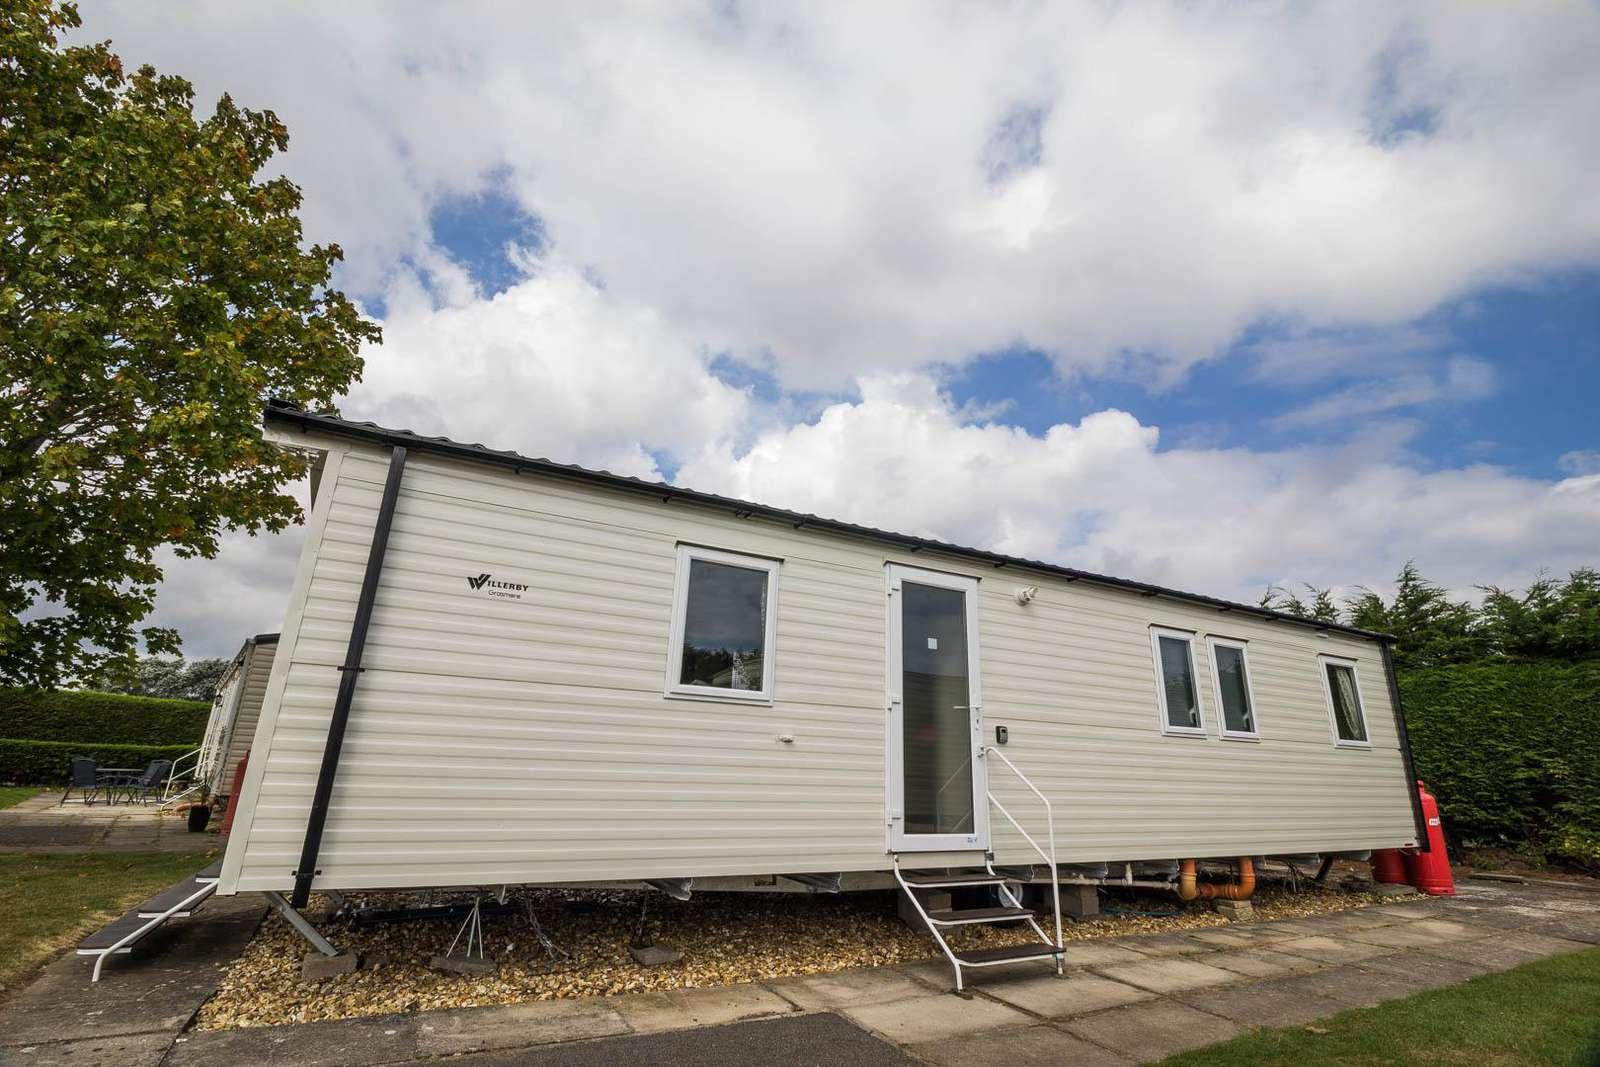 33022S – Springs area, 3 bed, 8 berth caravan near amenities. Diamond rated. - property